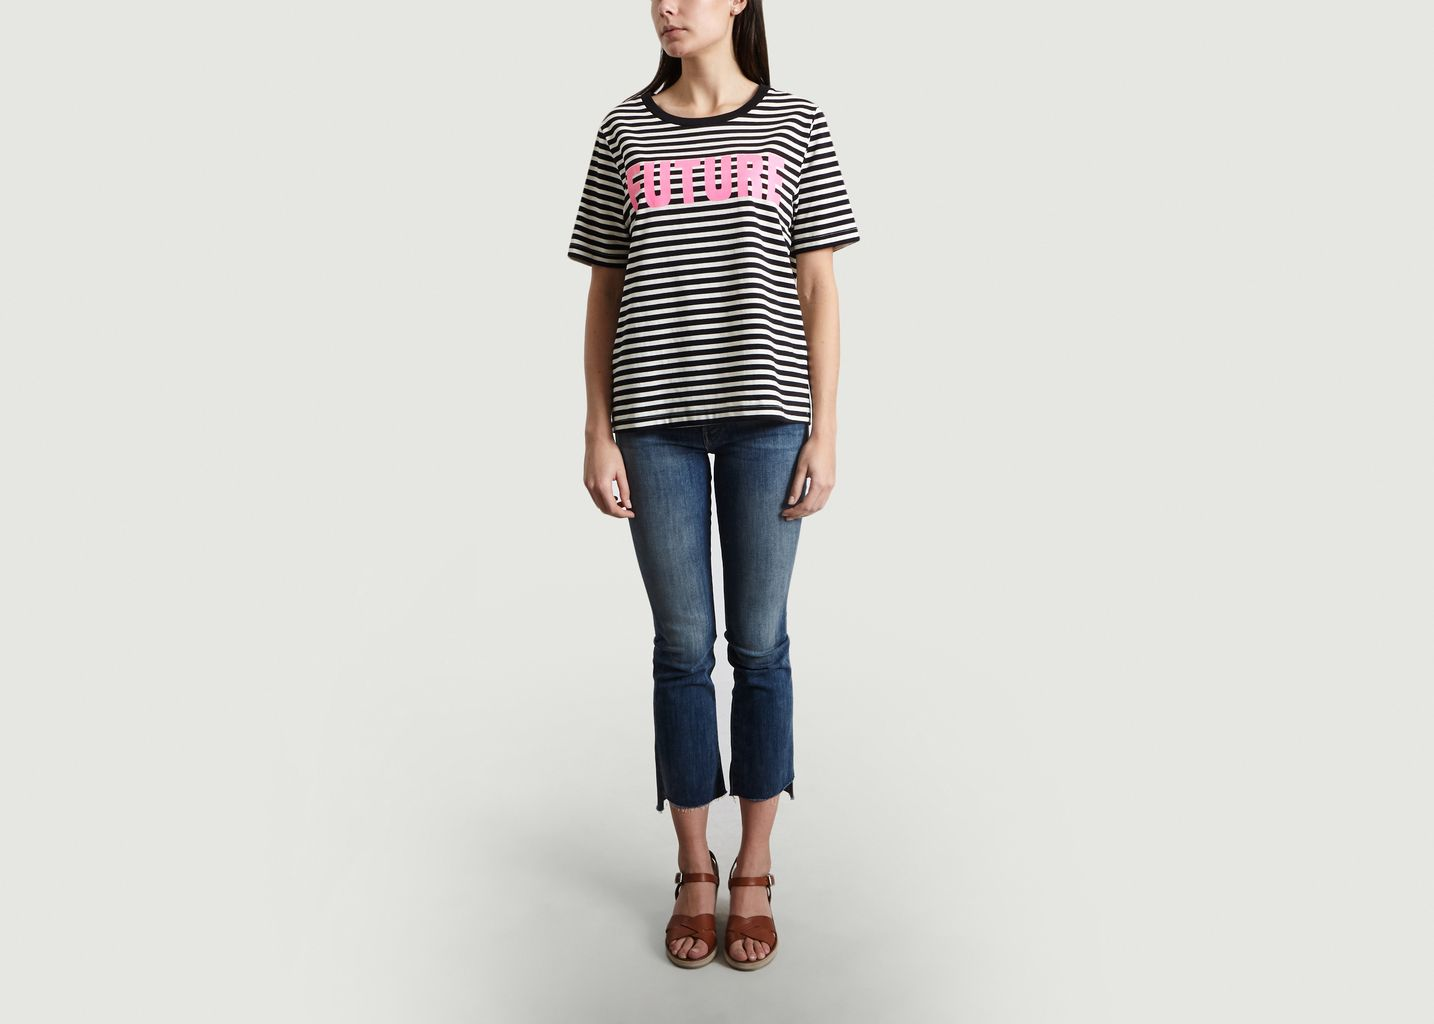 T-Shirt Rayé Print Future Sibamba - Essentiel Antwerp